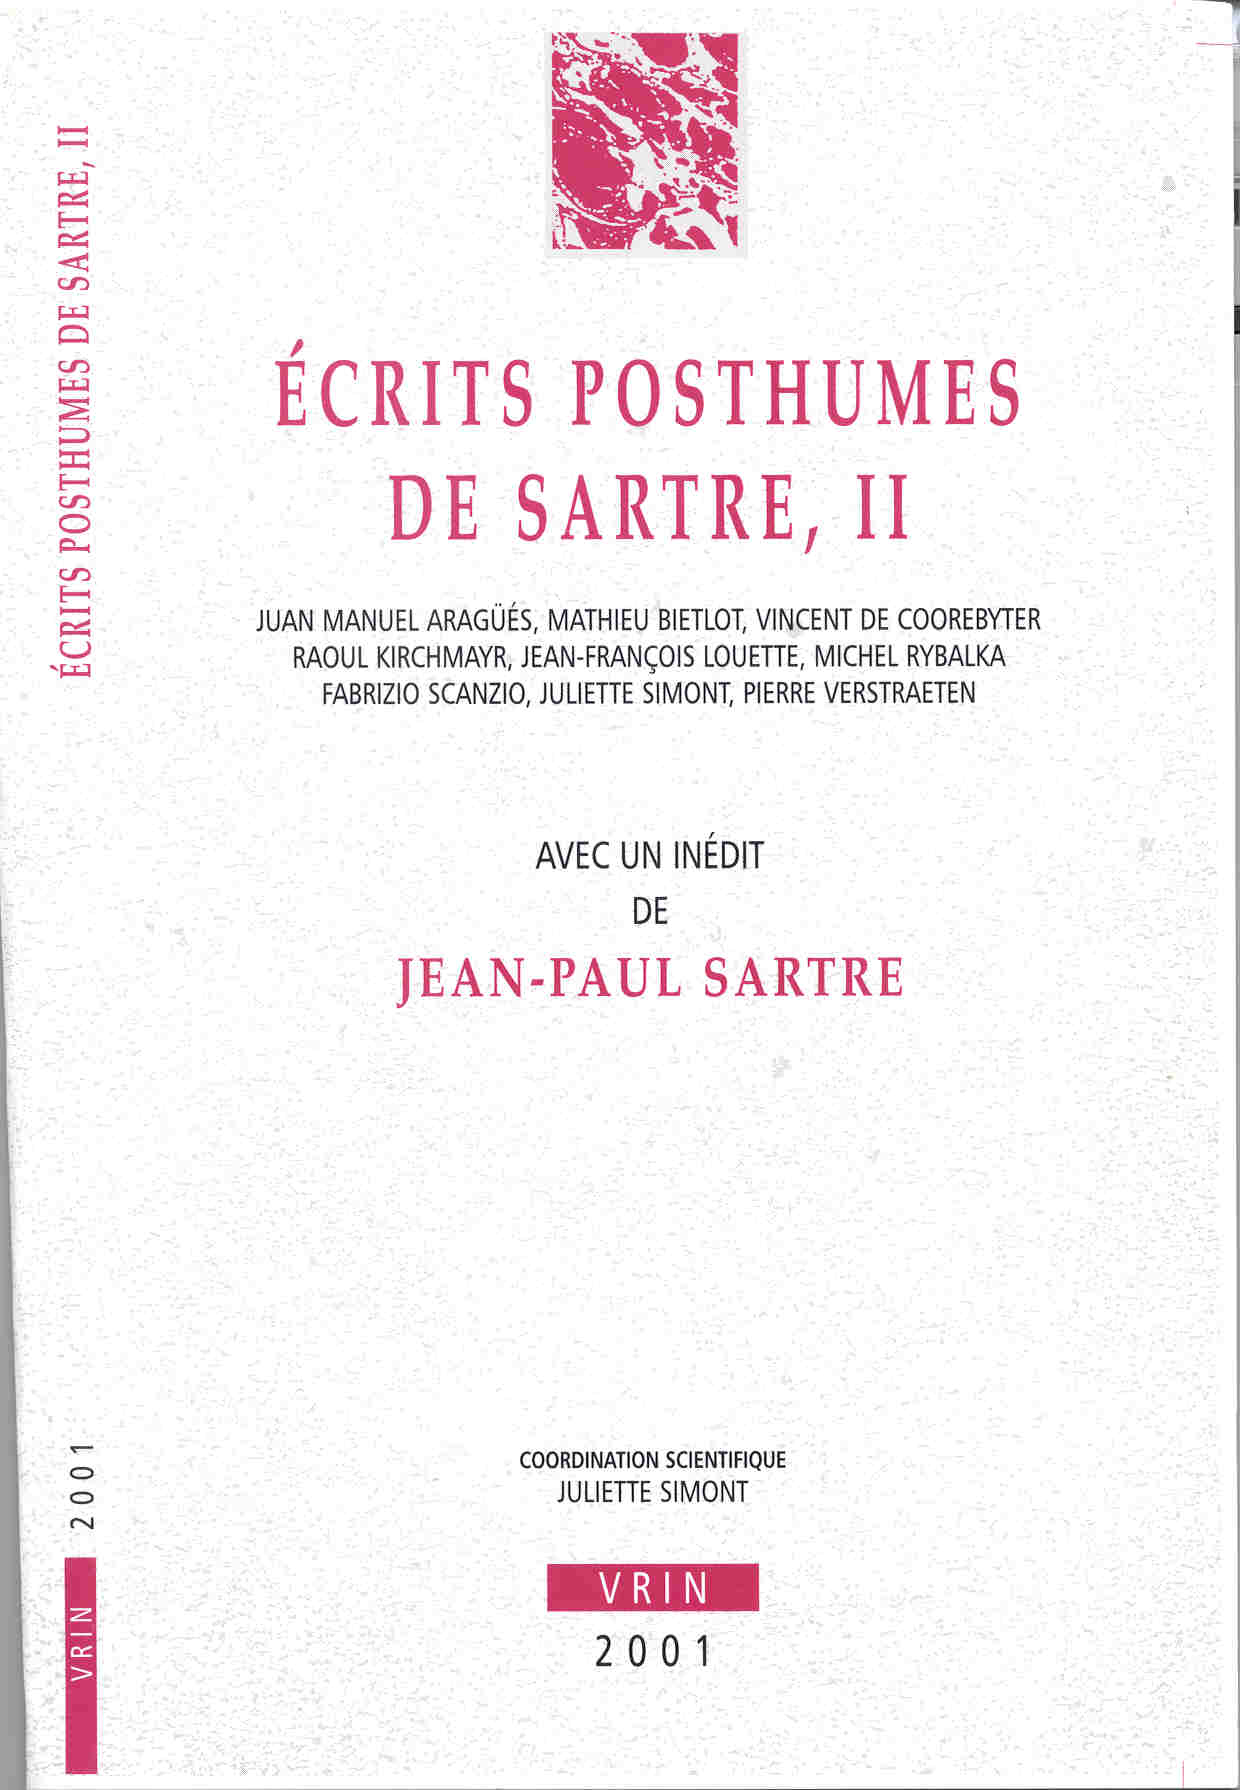 ANN UNIV BRUXELLES 2001,  ECRITS POSTHUMES DE SARTRE II